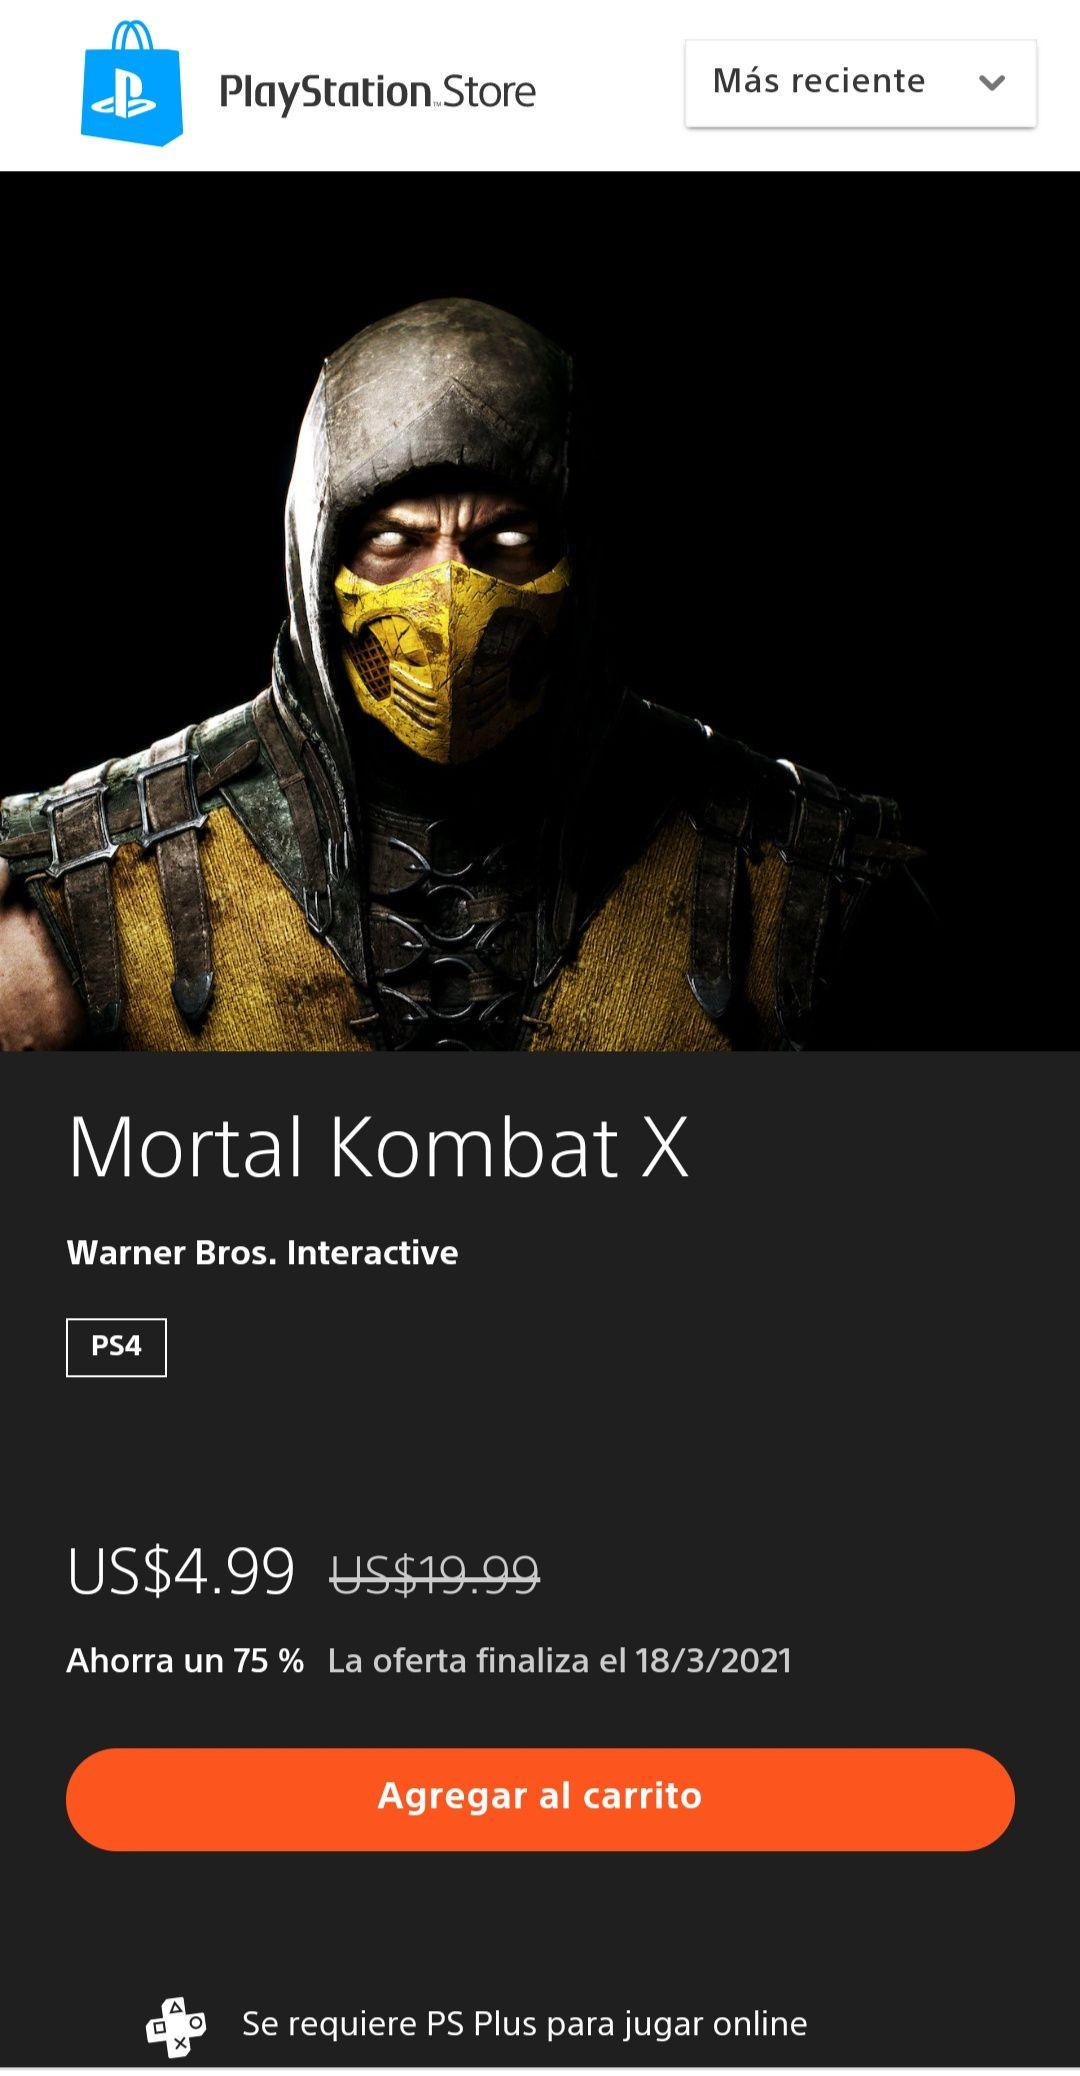 PSN Store: Mortal Kombat x